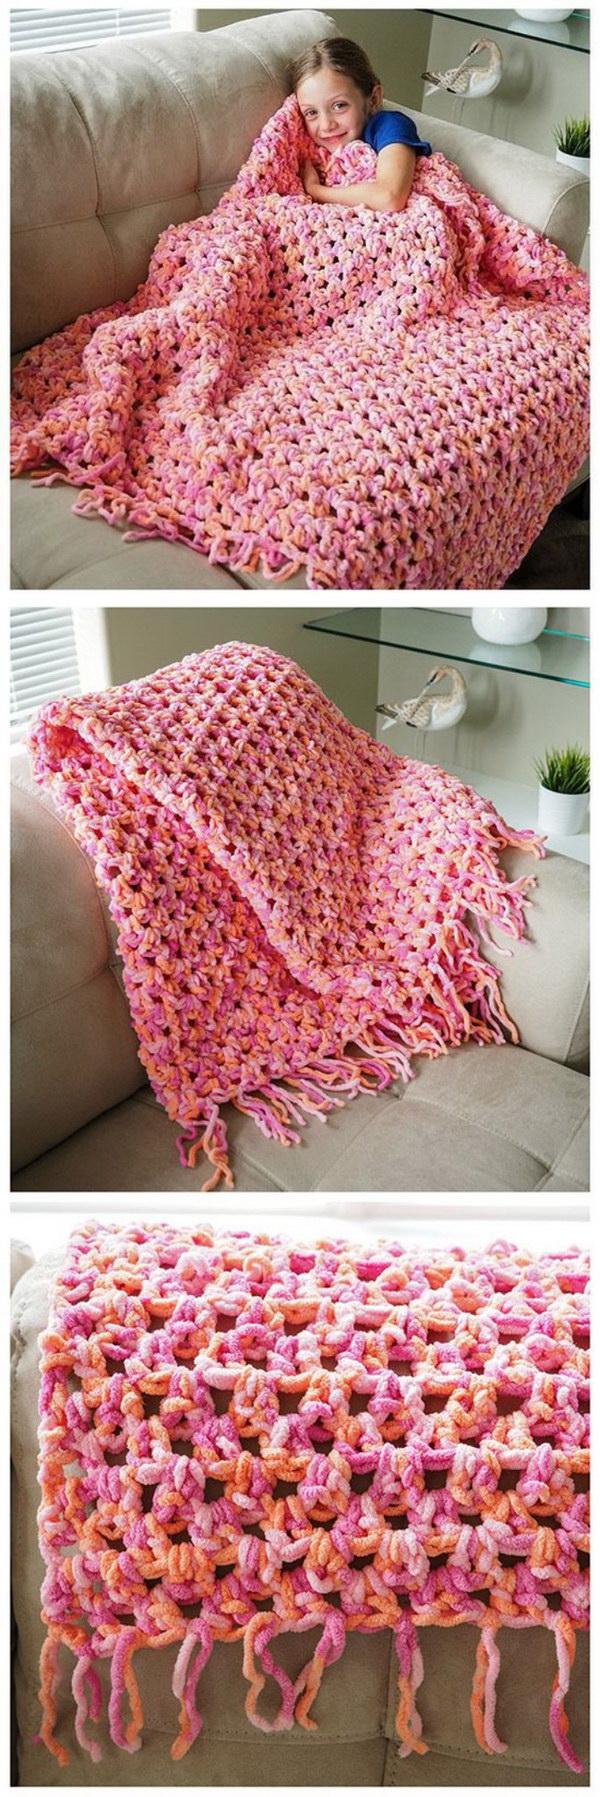 Sofa Blanket Beginners Crochet Pattern.